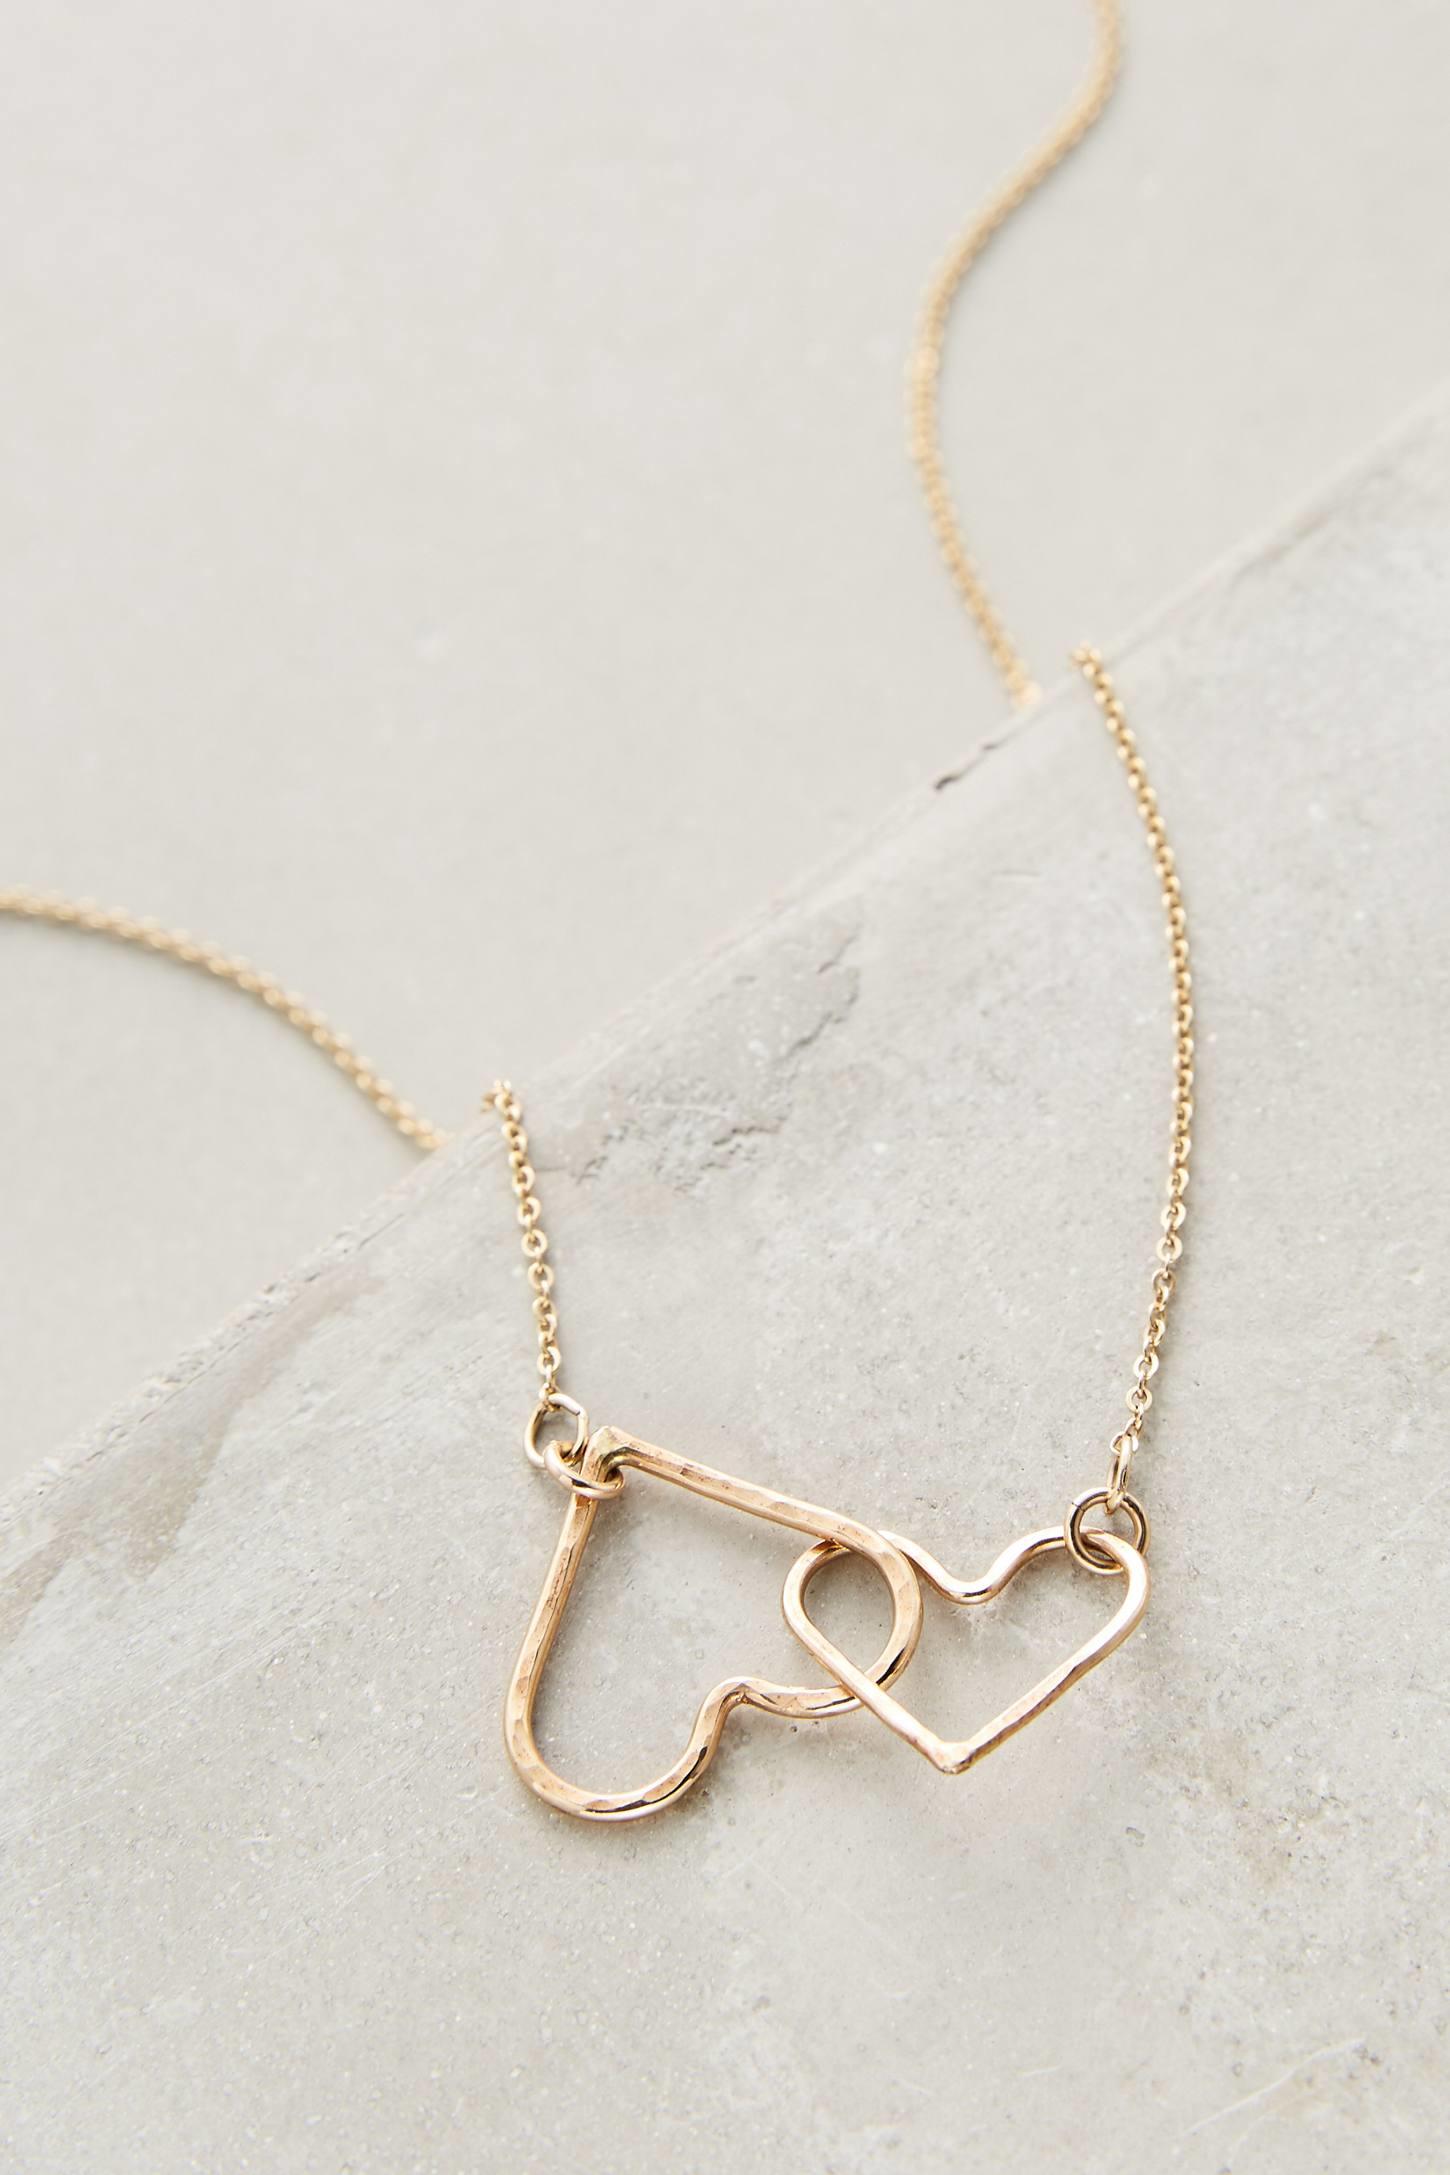 nashelle beloved necklace in metallic lyst